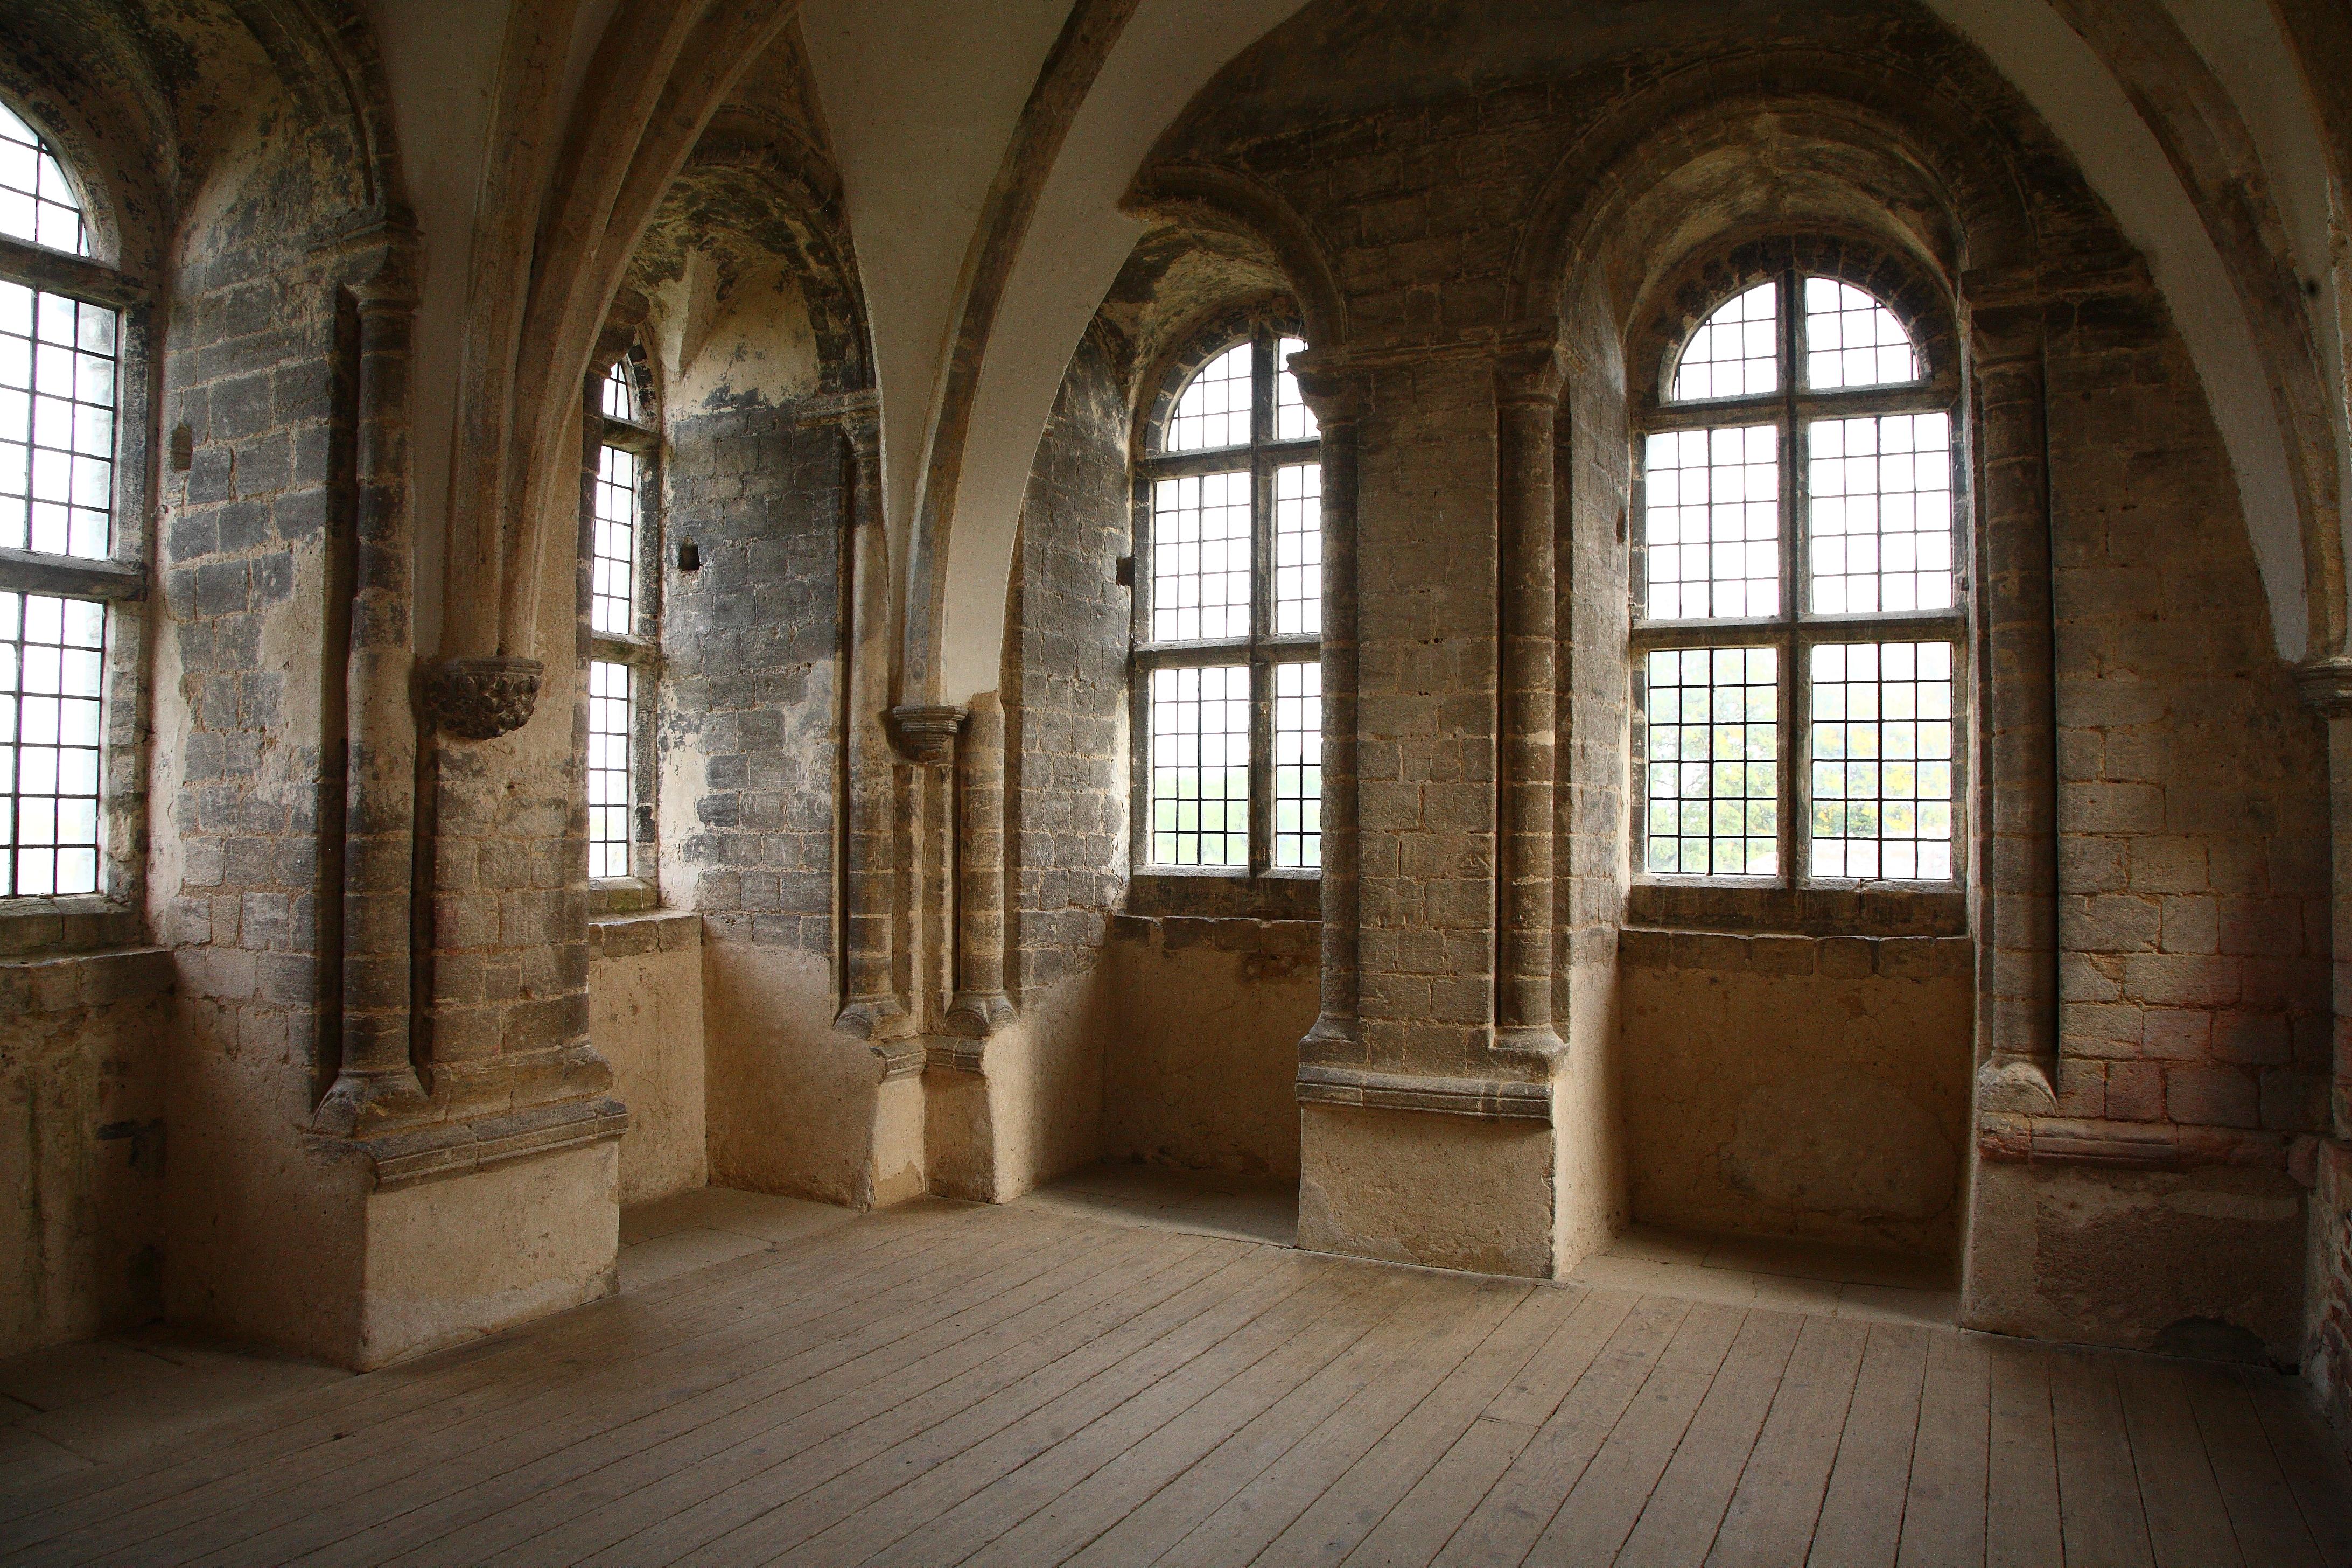 Pin by giselle ottonello on stone walls pinterest - Castle room decore ...